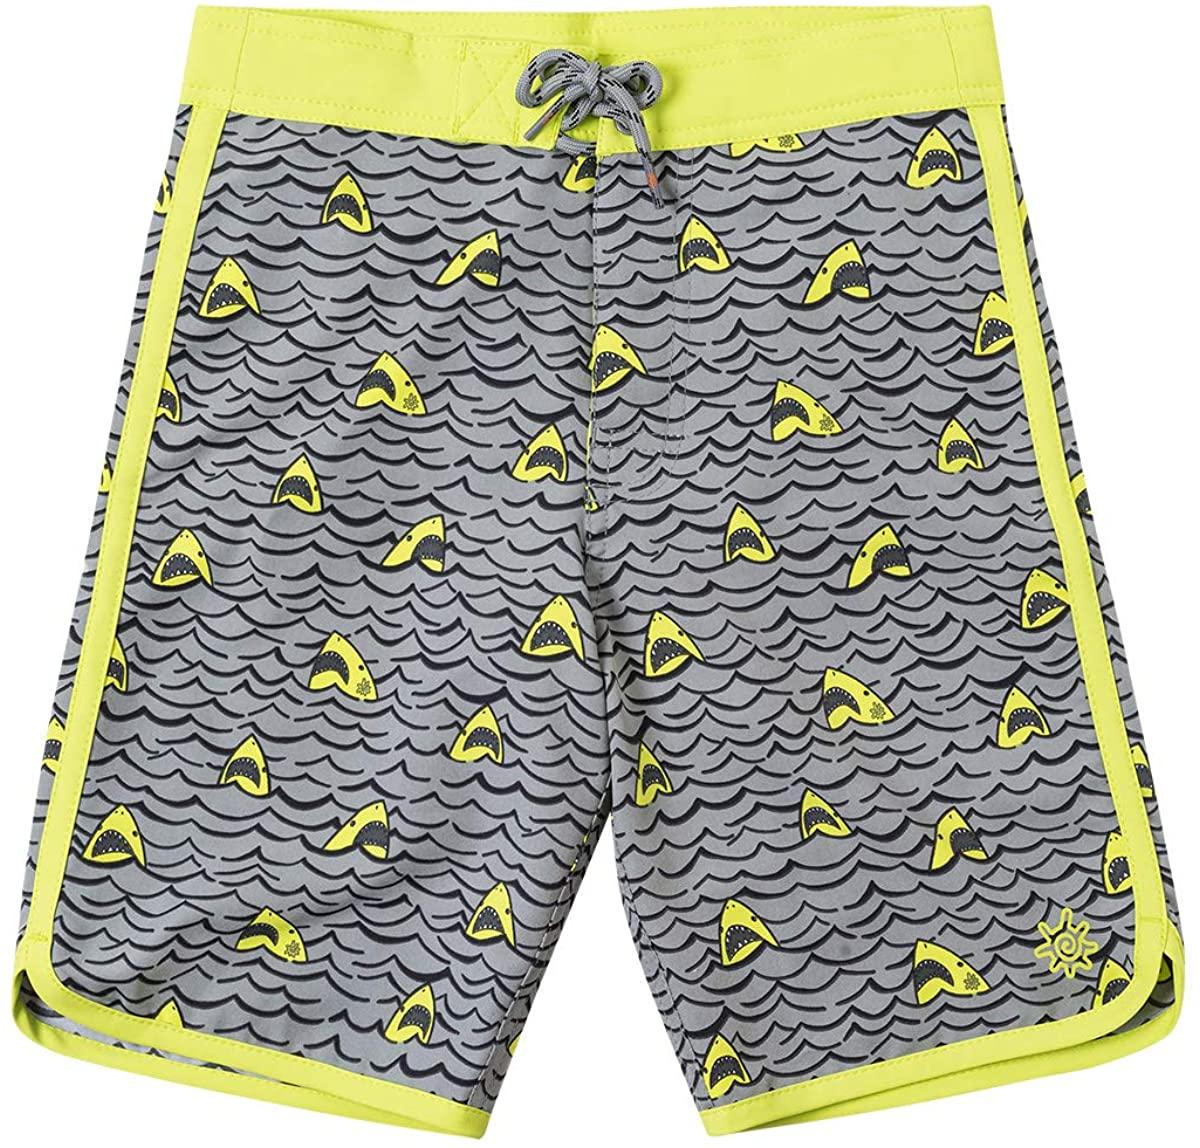 UV SKINZ Boys Retro Board Shorts